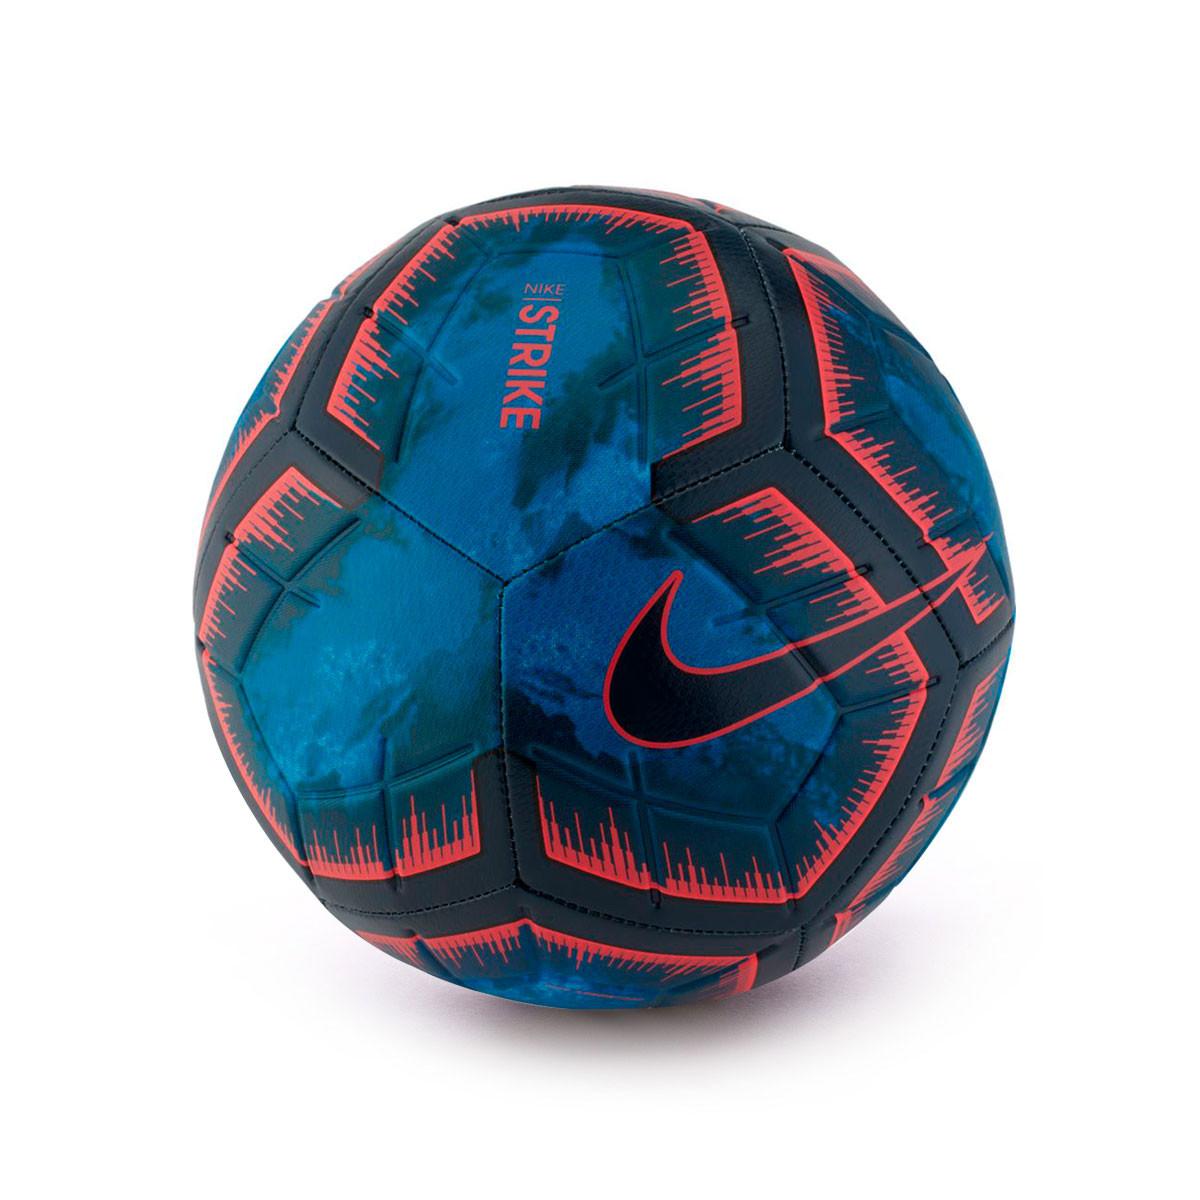 Ball Nike Strike Night 2018-2019 Obsidian-Bright crimson - Football ... 9ec16921a03e6